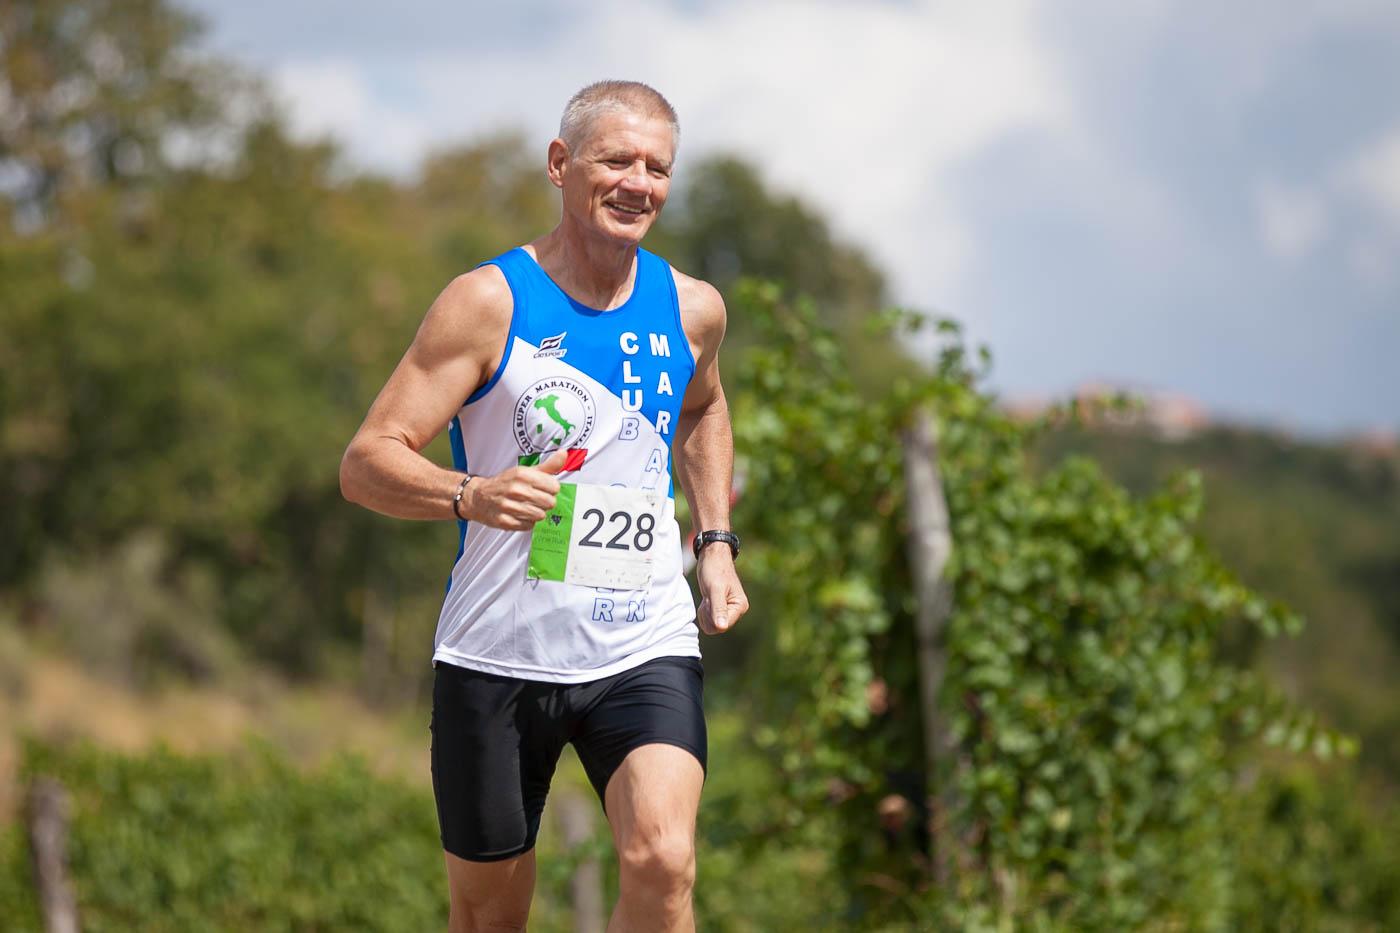 [INTERVJU] Franjo Lončar u Ljubljani istrčao svoj 250. maraton!